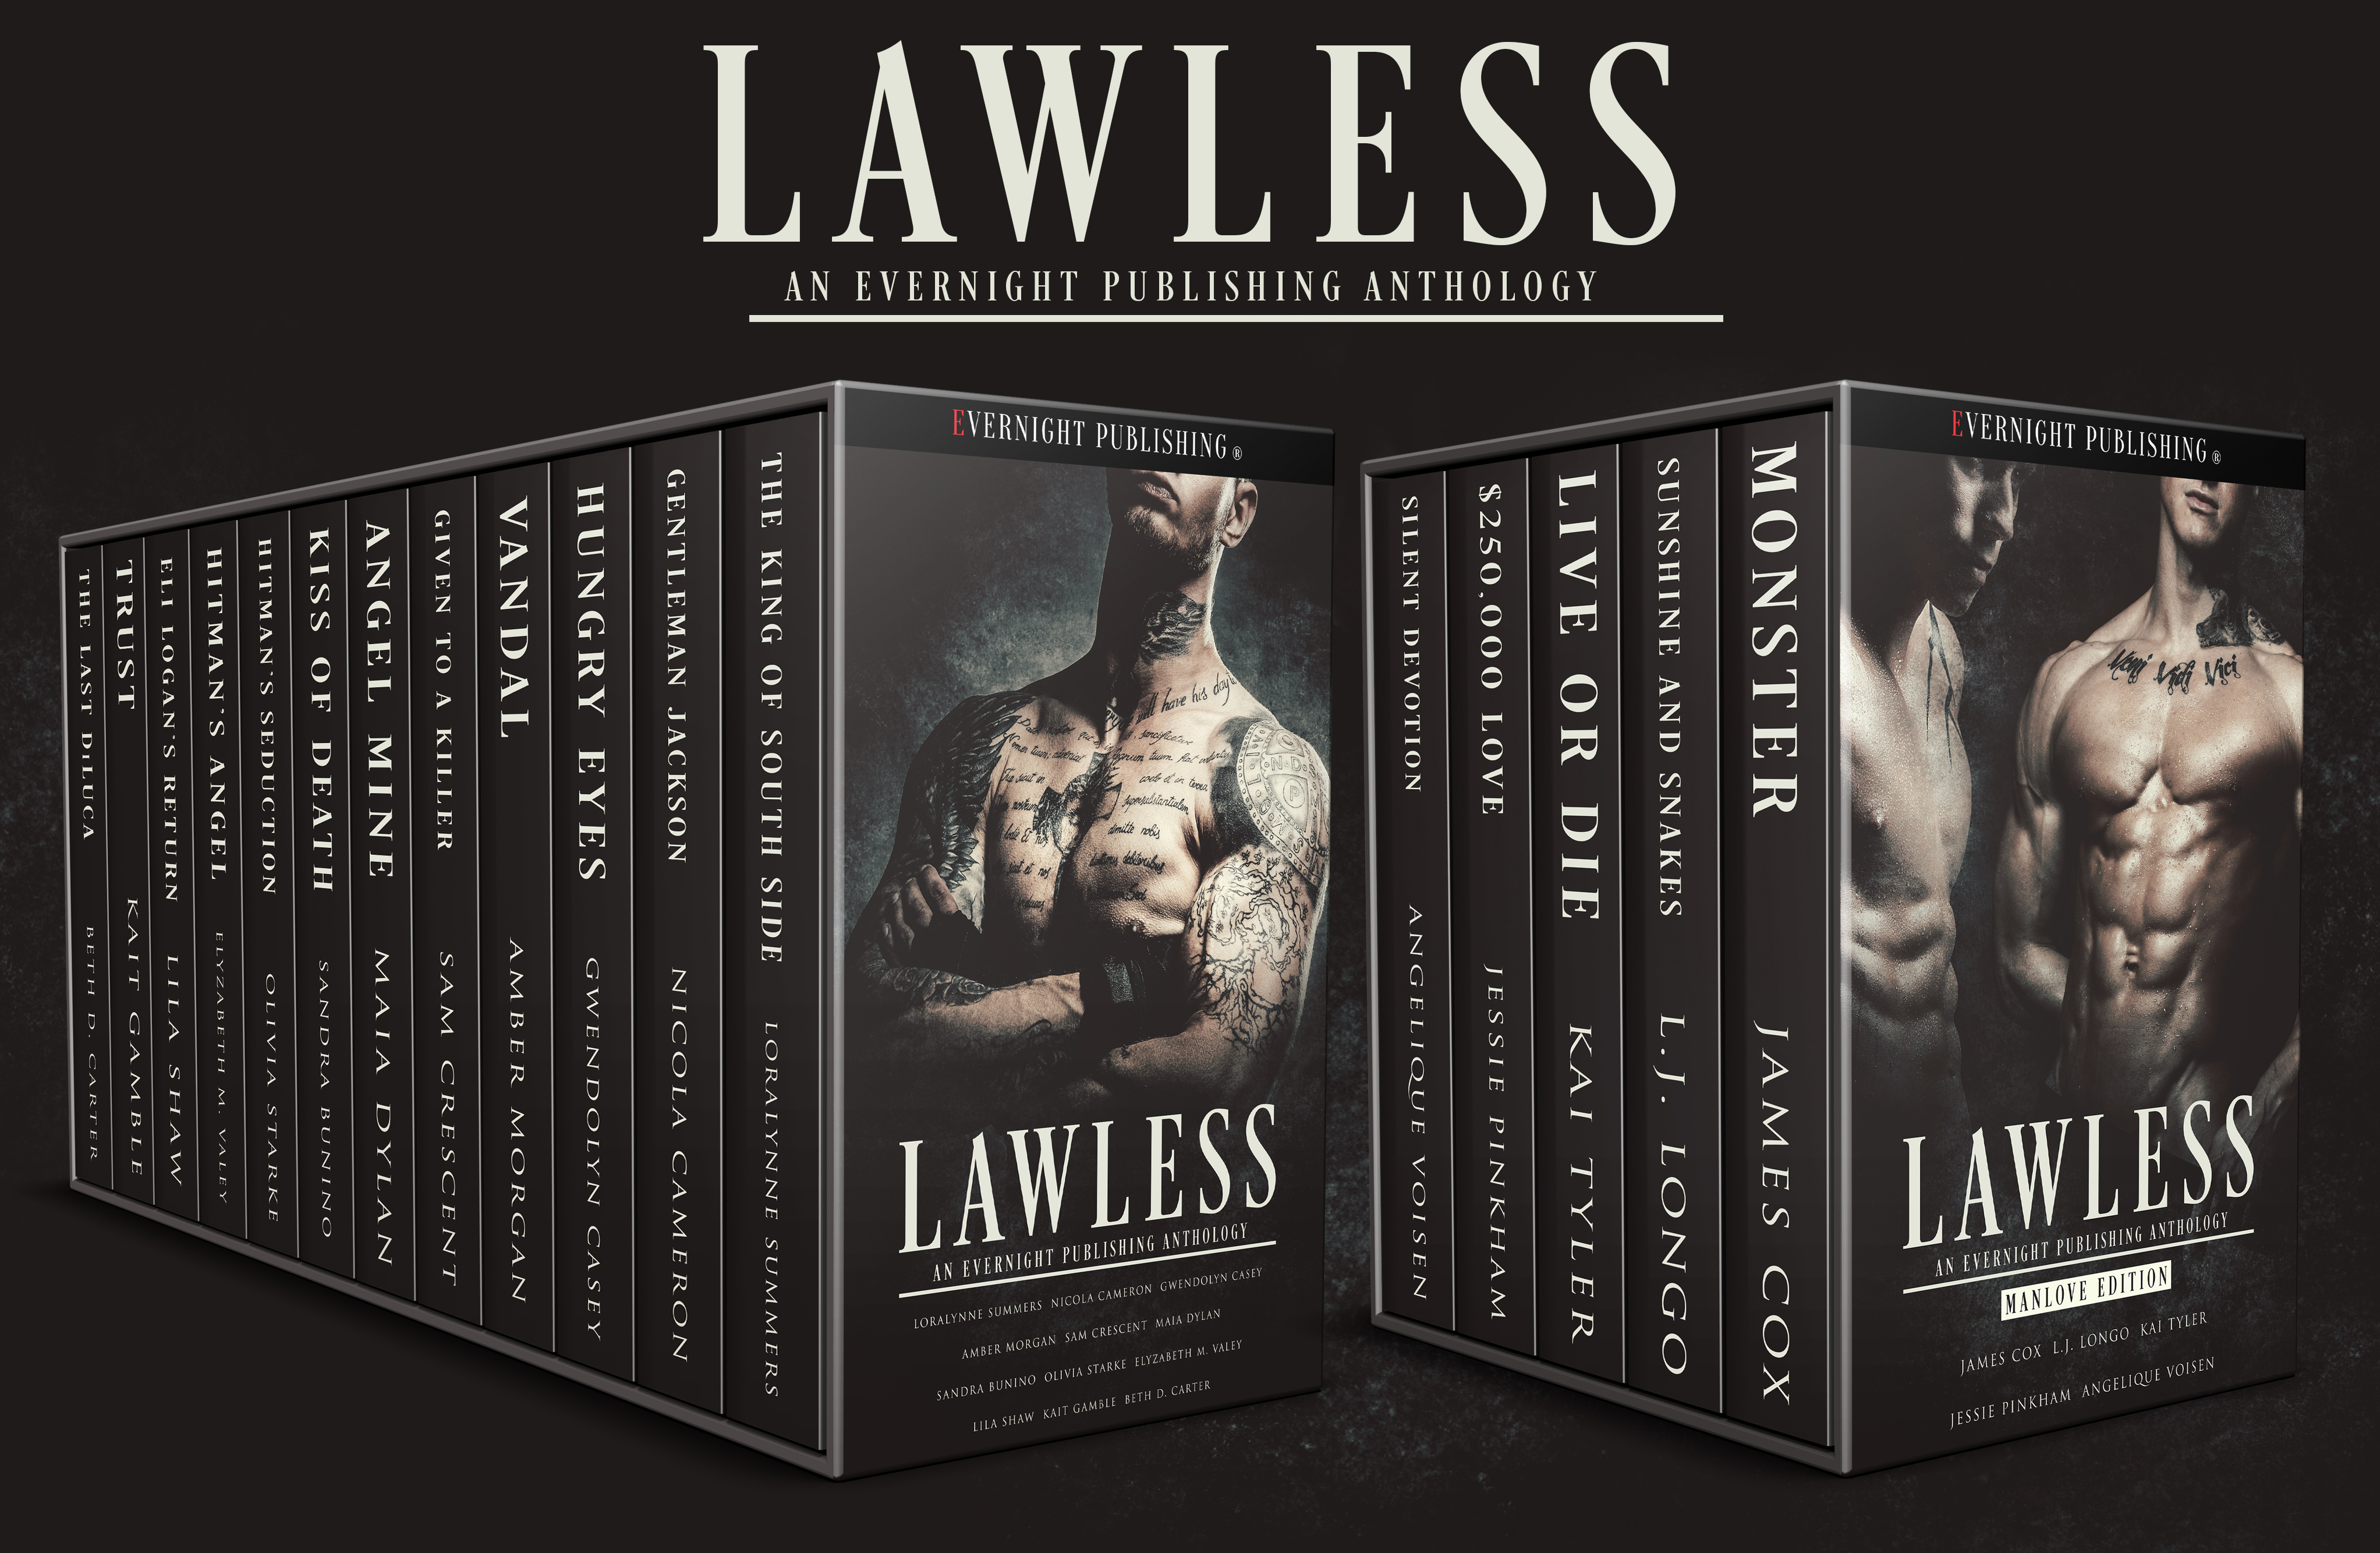 lawless-antho-mf-evernightpublishing-sept2017-3d-twin-boxset.jpg